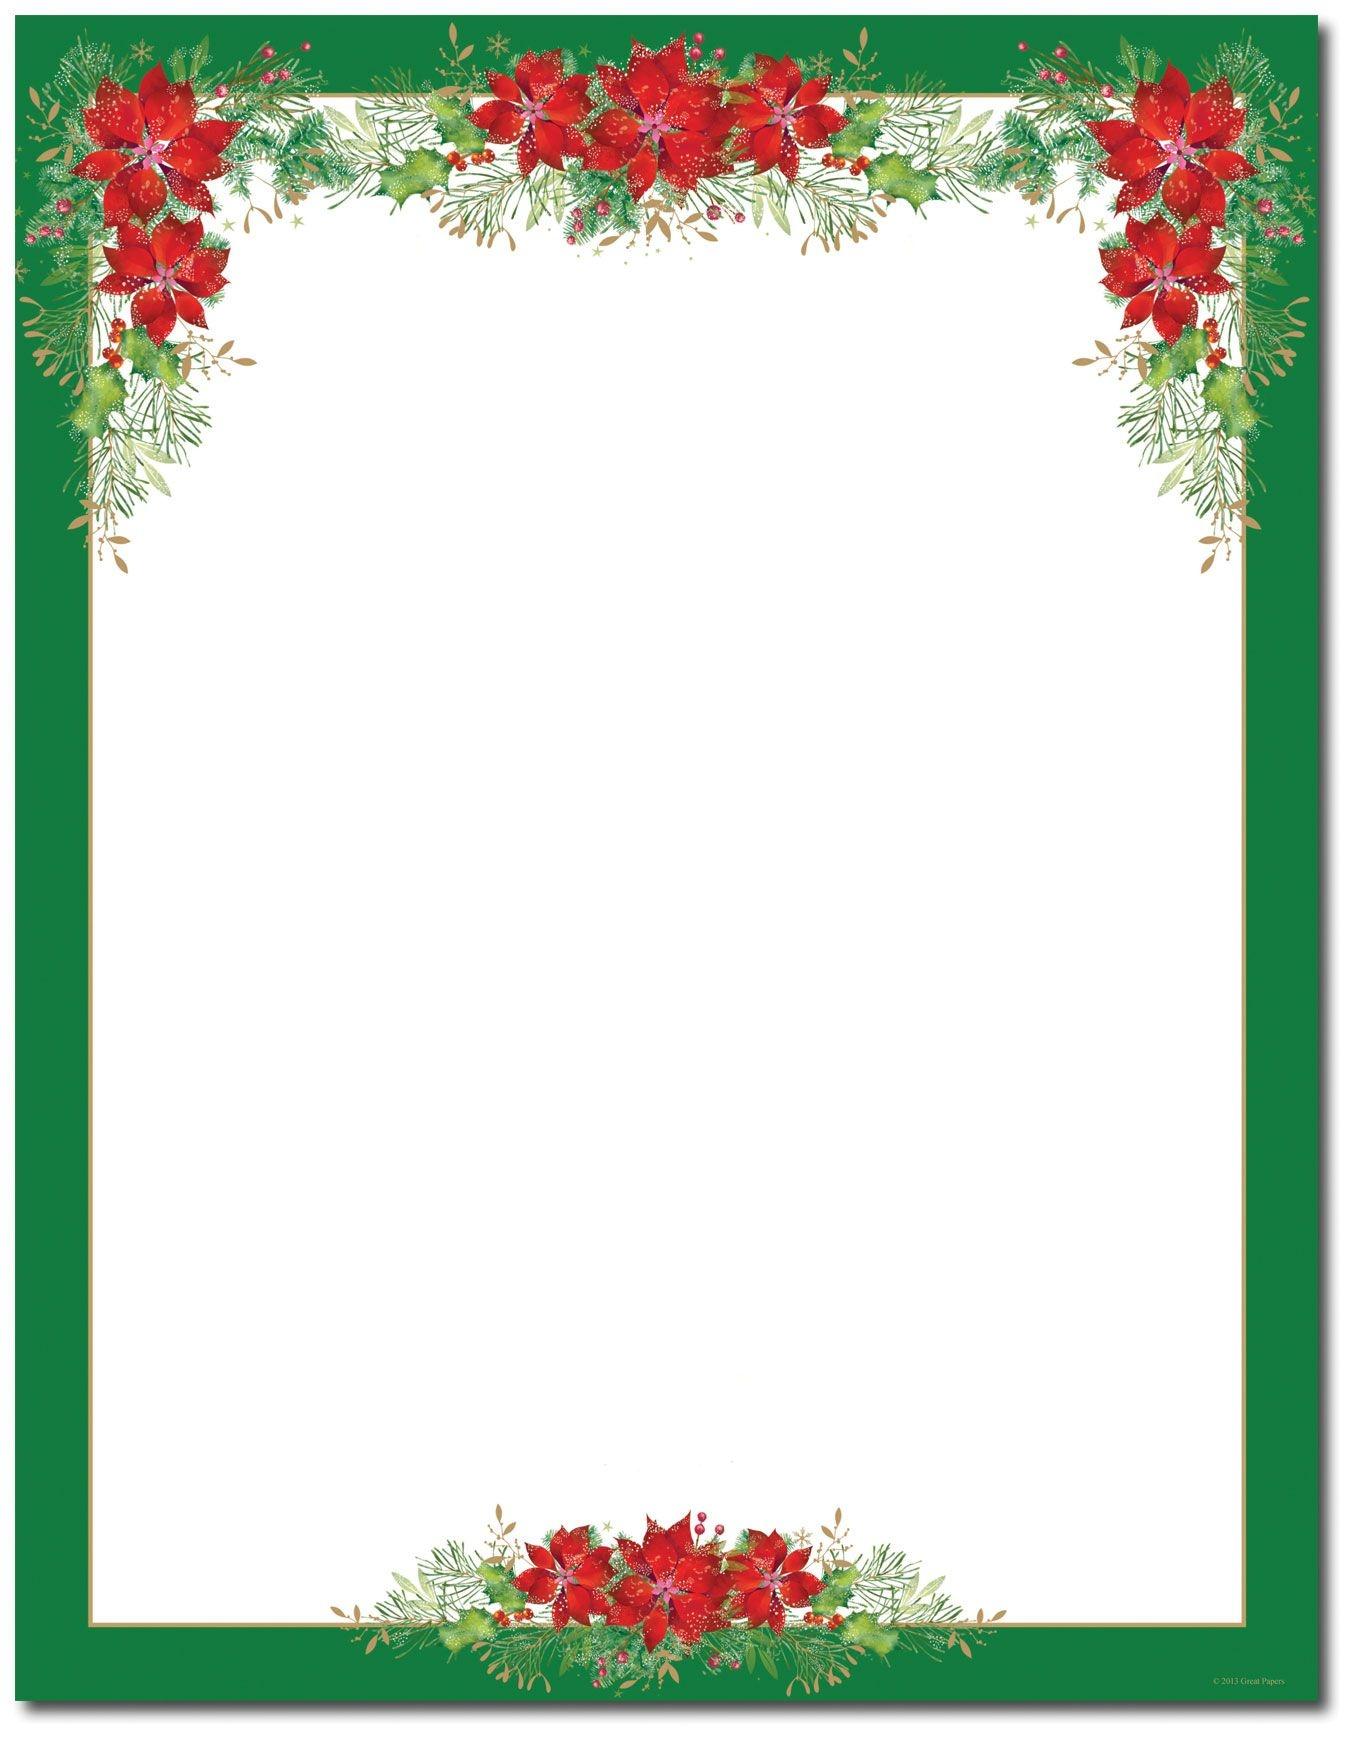 Poinsettia Valance Letterhead   Holiday Papers   Christmas Border - Free Printable Christmas Letterhead